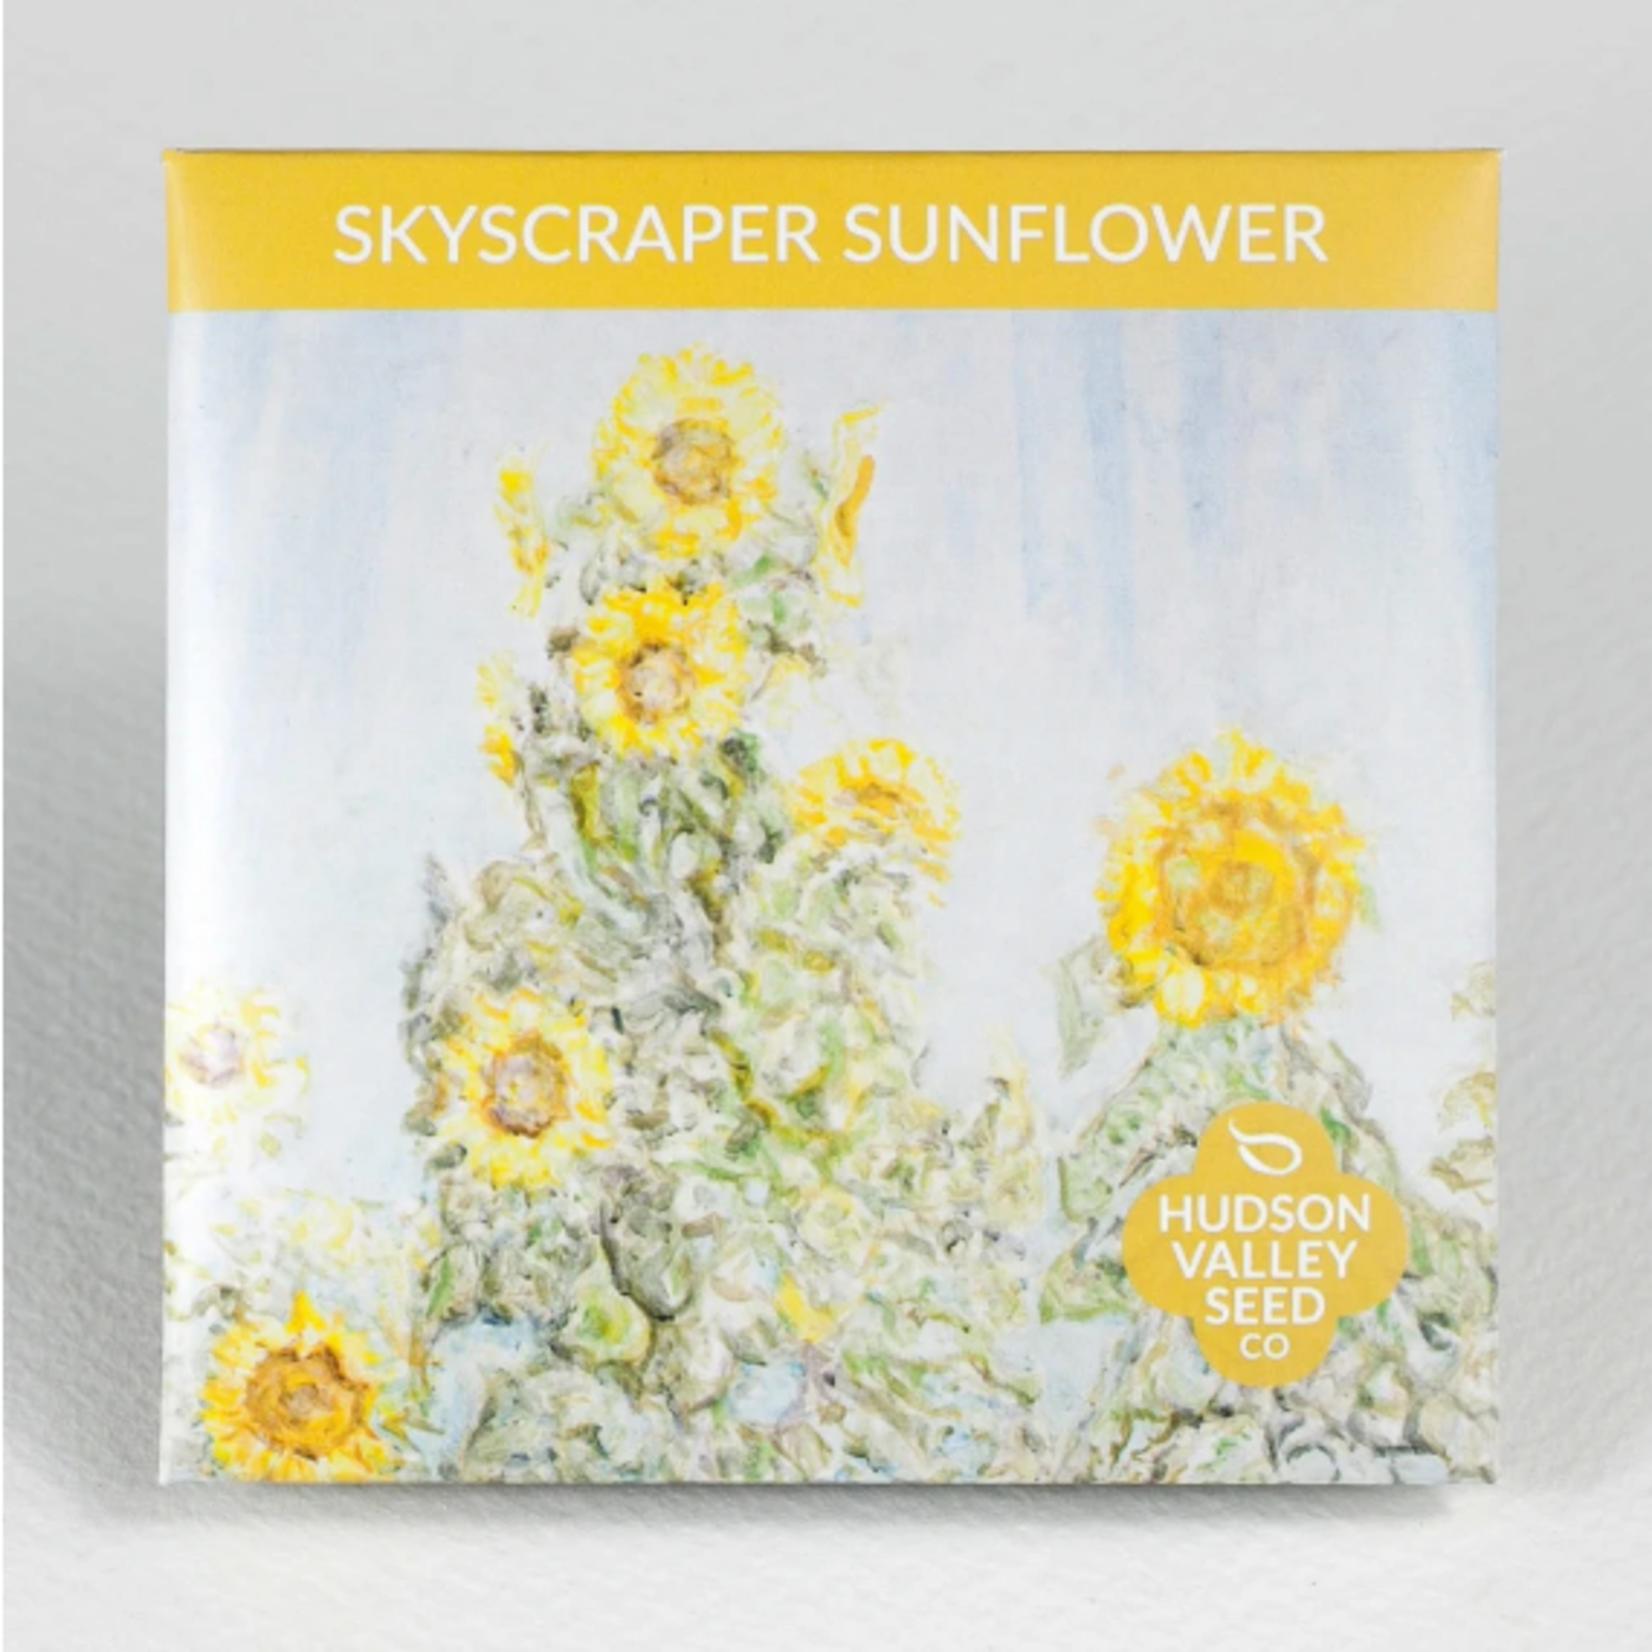 Hudson Valley Seeds Skyscraper Sunflower Seeds